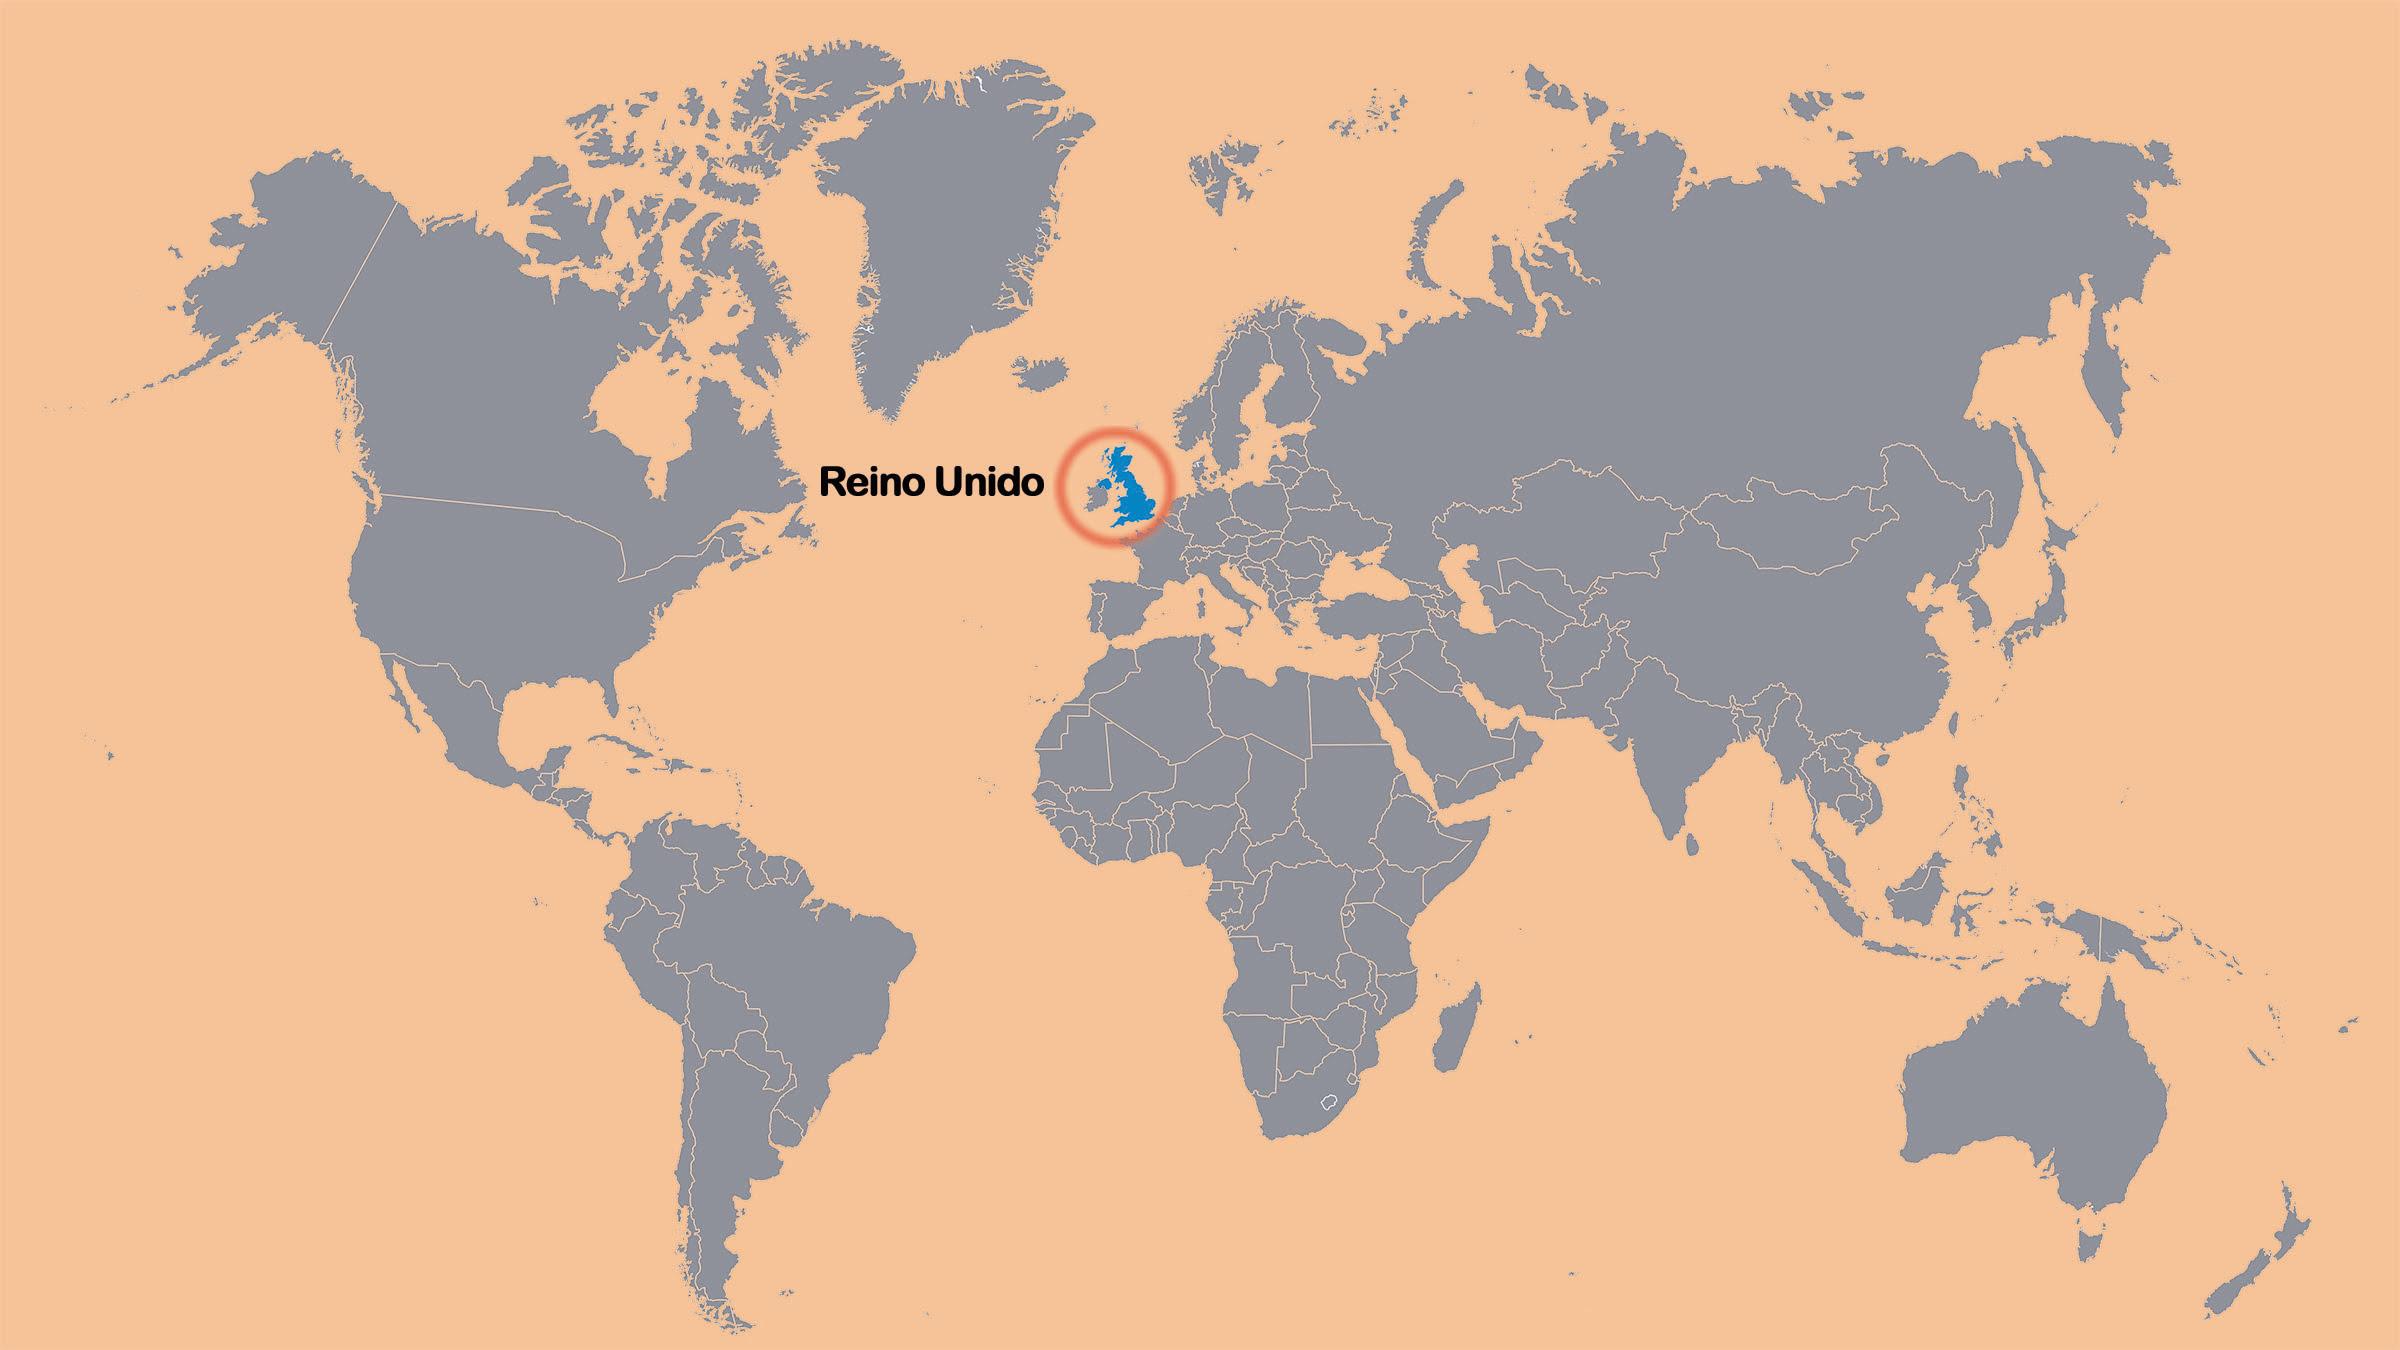 londres mapa mundo Mapa mundial señalando Reino Unido londres mapa mundo